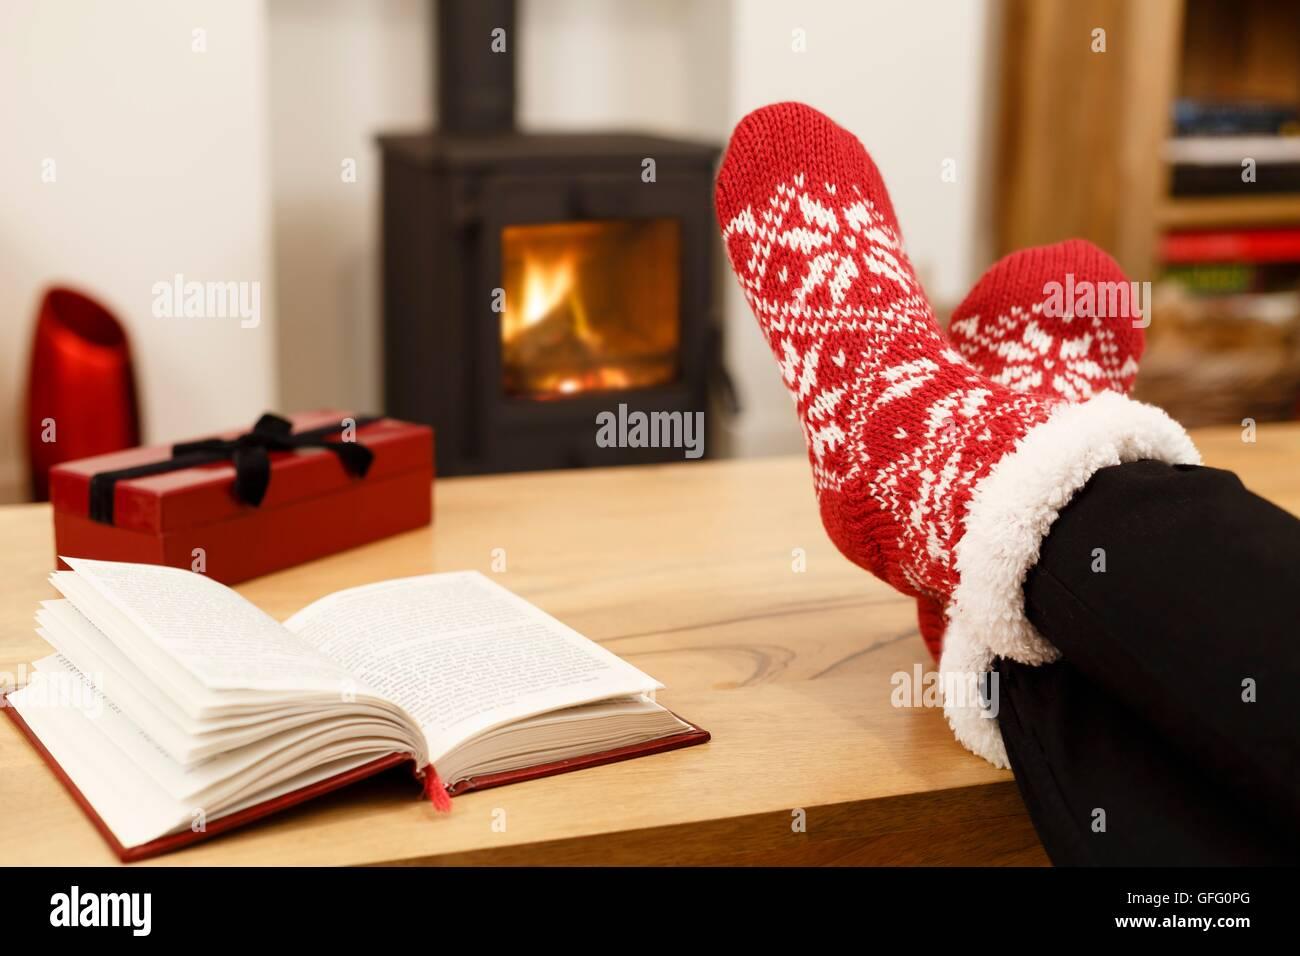 f e zum feuer stockfotos f e zum feuer bilder alamy. Black Bedroom Furniture Sets. Home Design Ideas